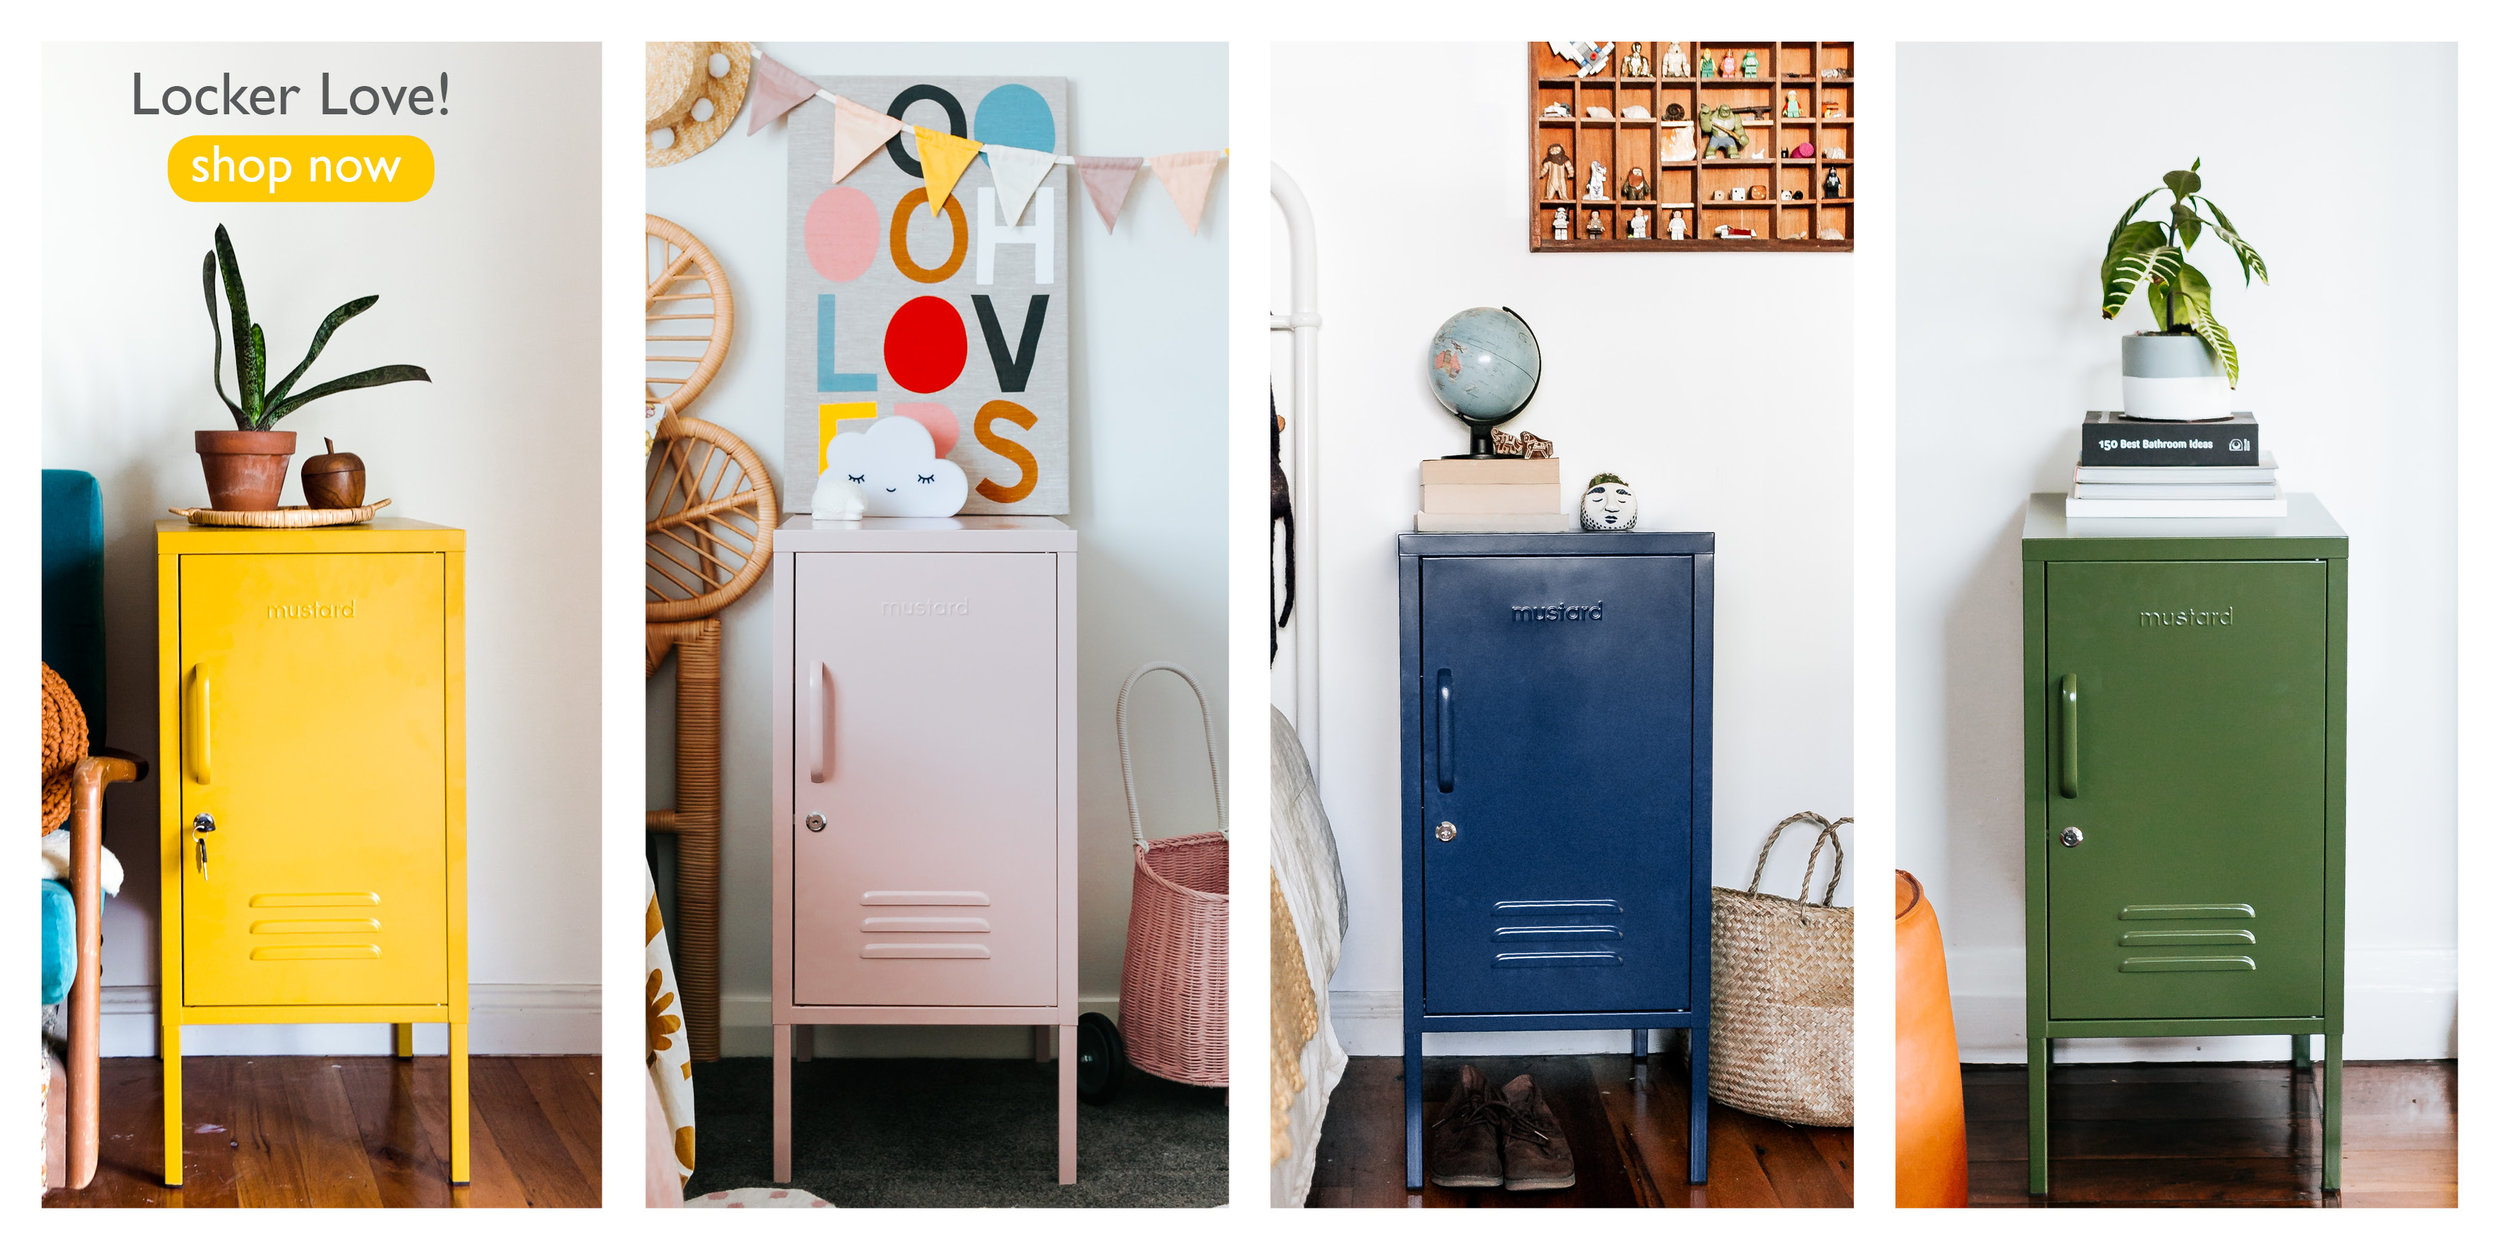 colourful metal lockers